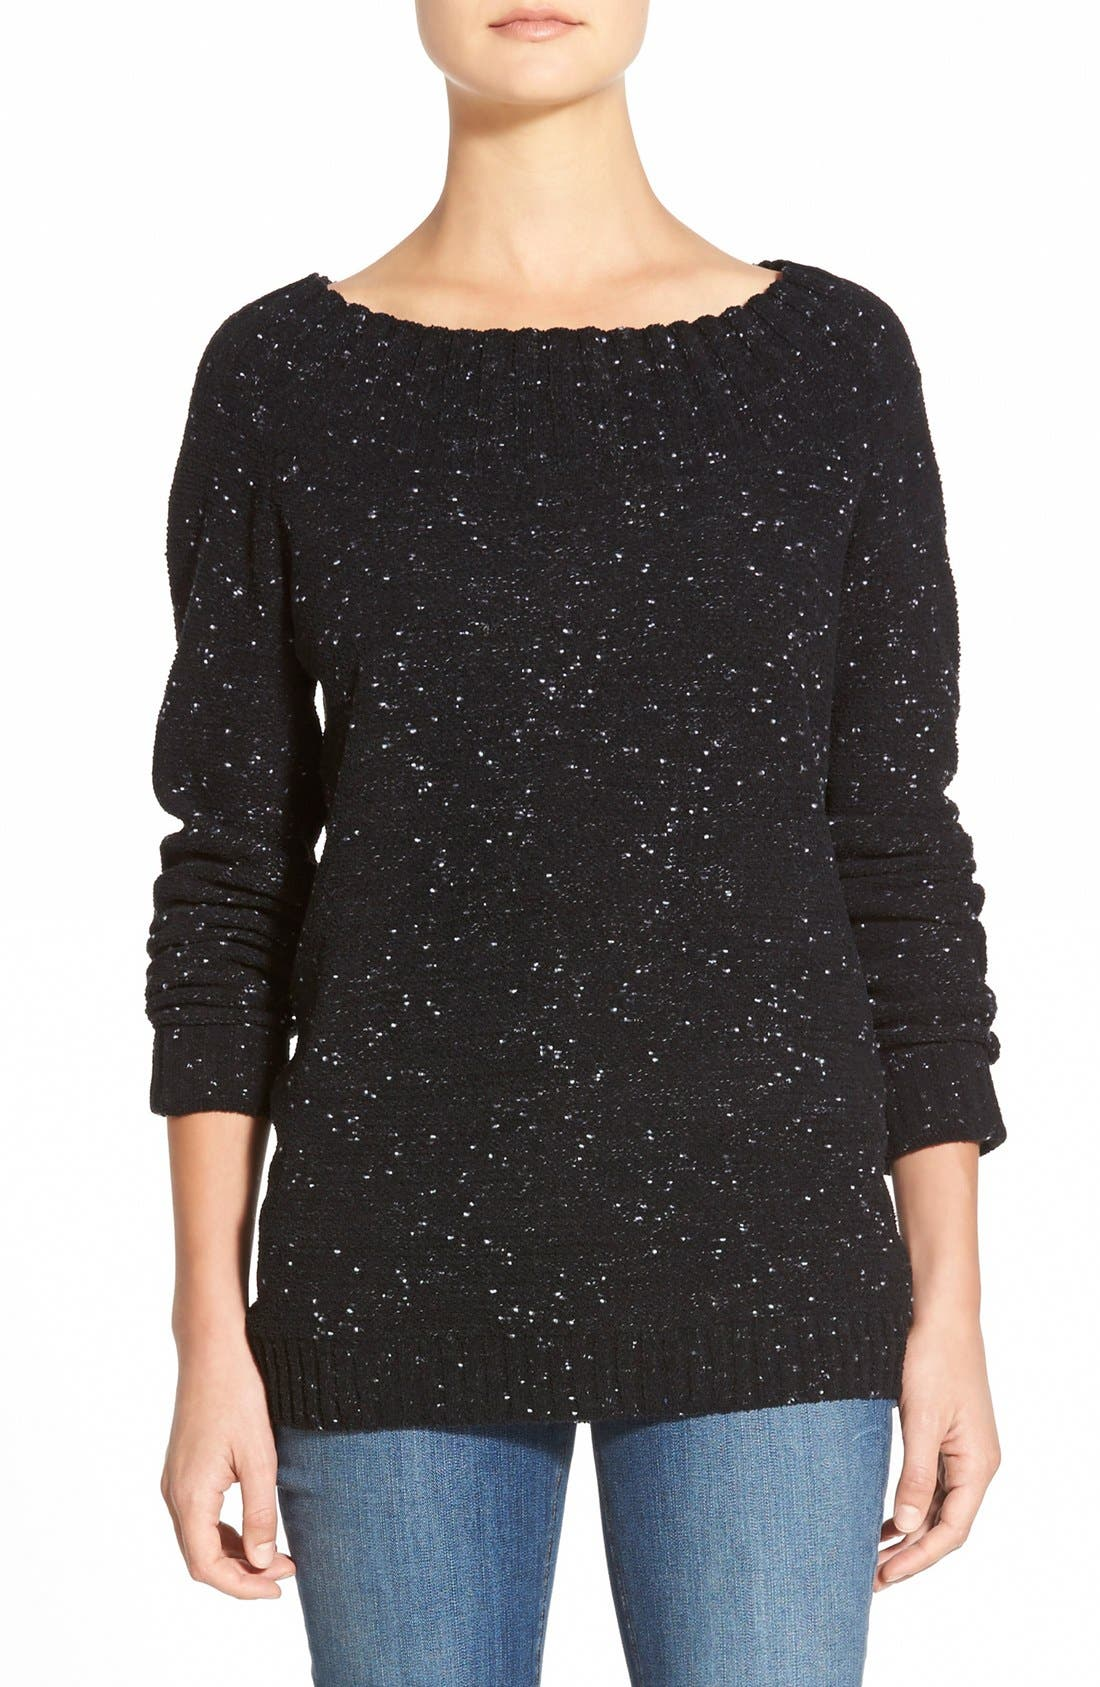 Hinge 'Marilyn' Sweater